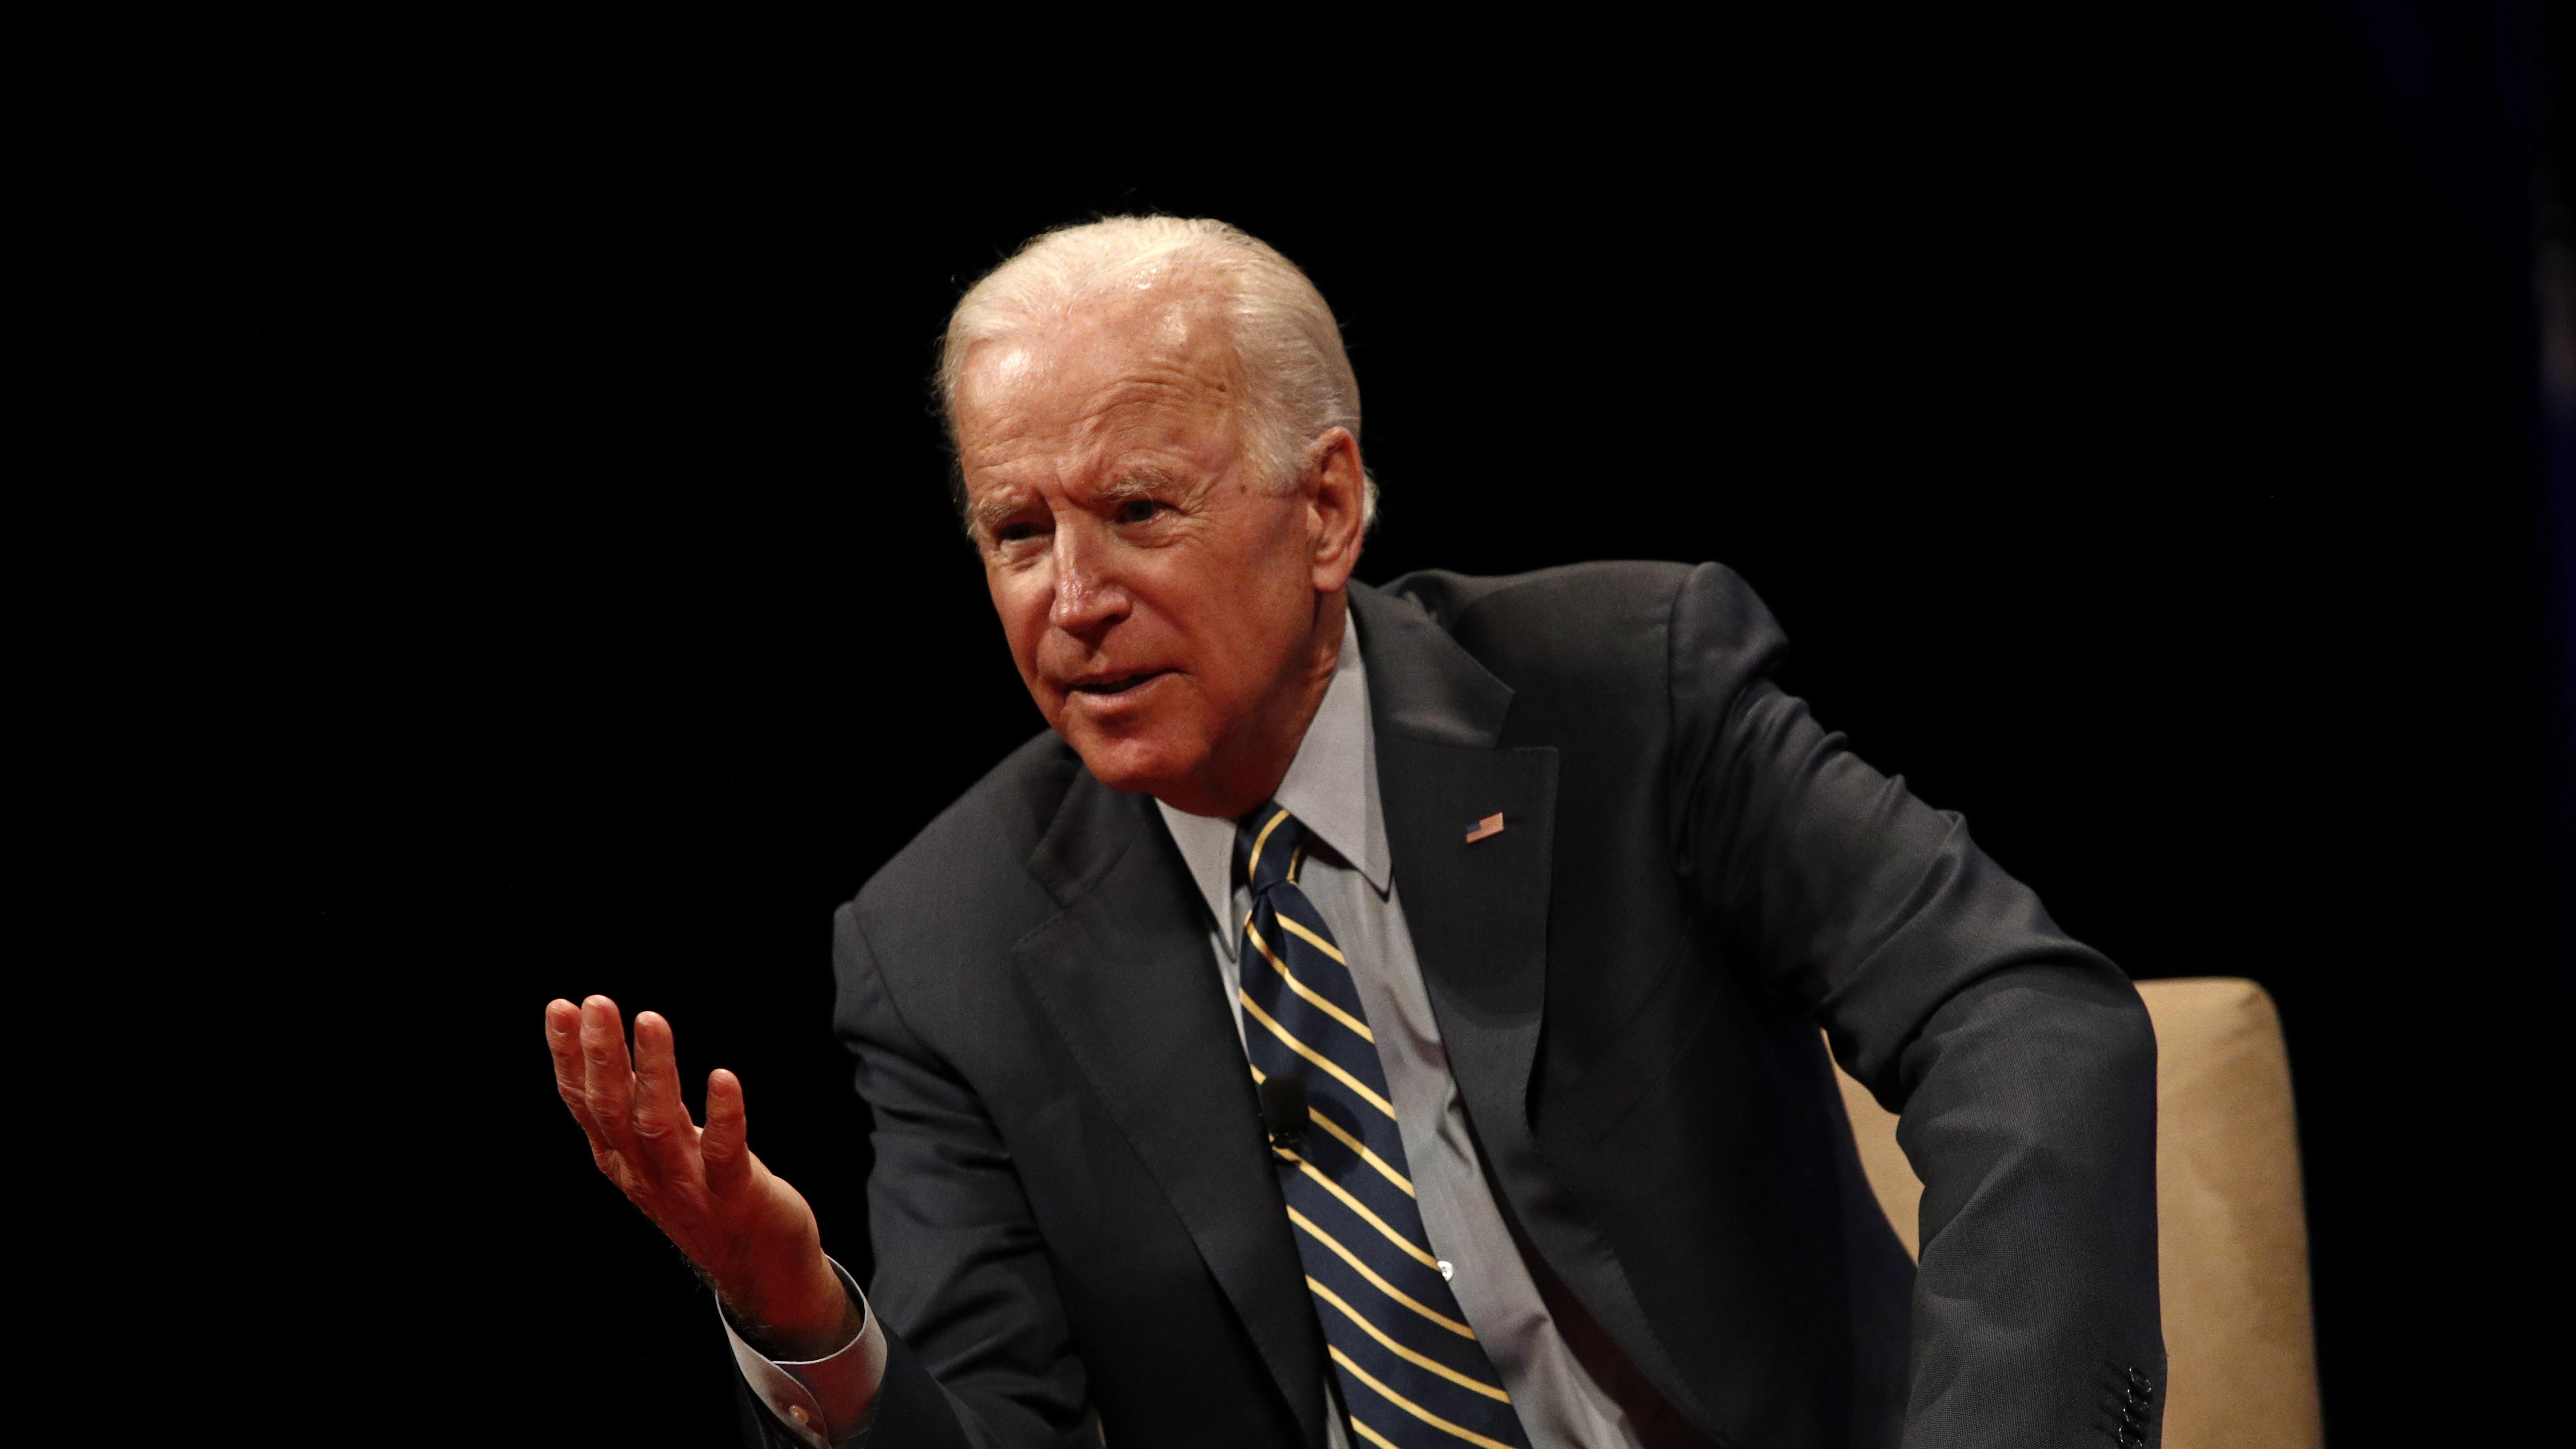 Joe Biden vs. Donald Trump in 2020? Poll predicts victor